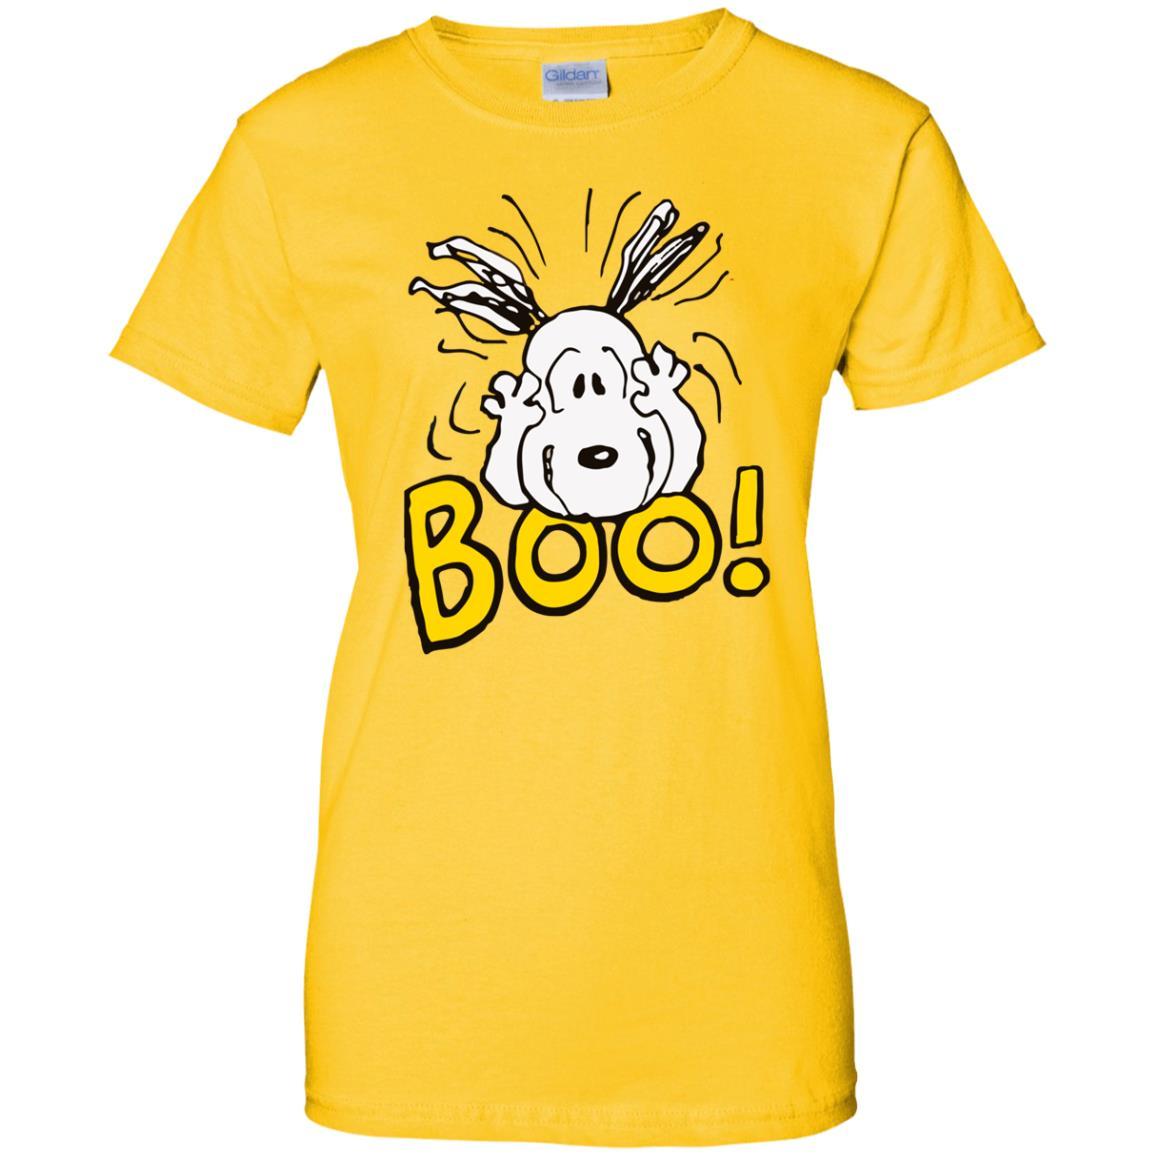 image 2238 - Peanuts Snoopy Halloween Boo shirt, hoodie, tank